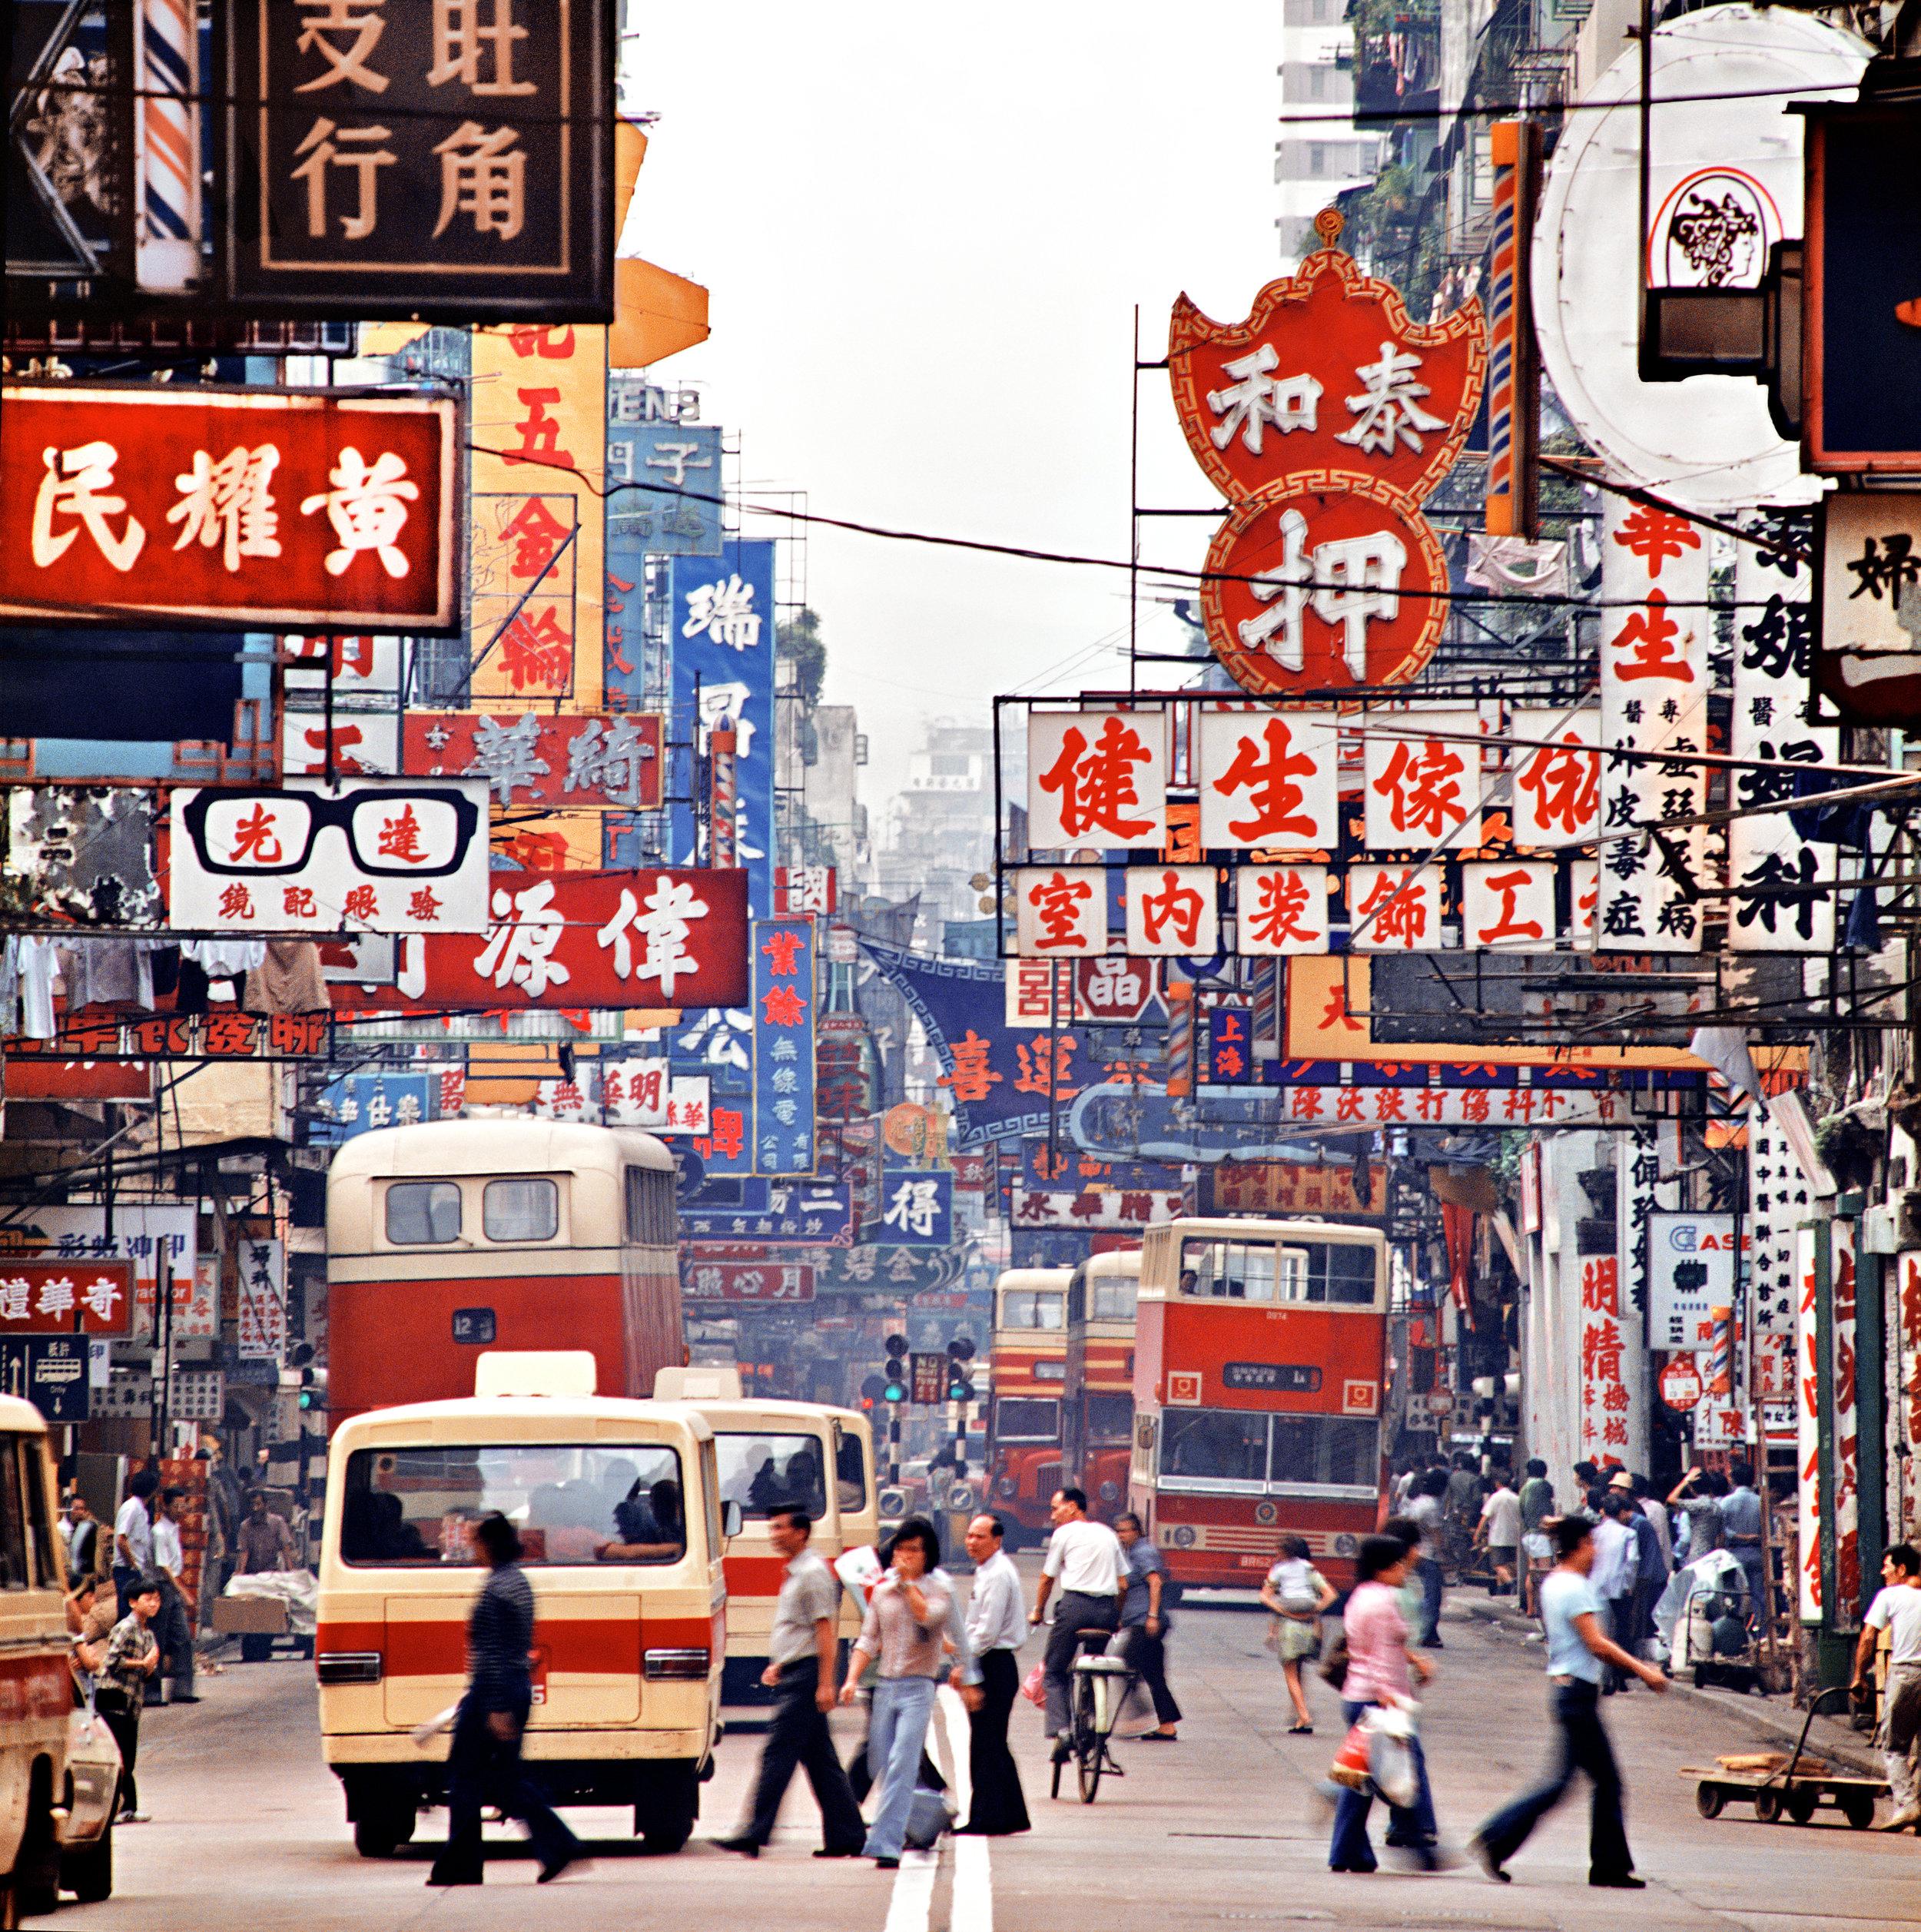 Keith Macgregor, Shanghai Street, 1980